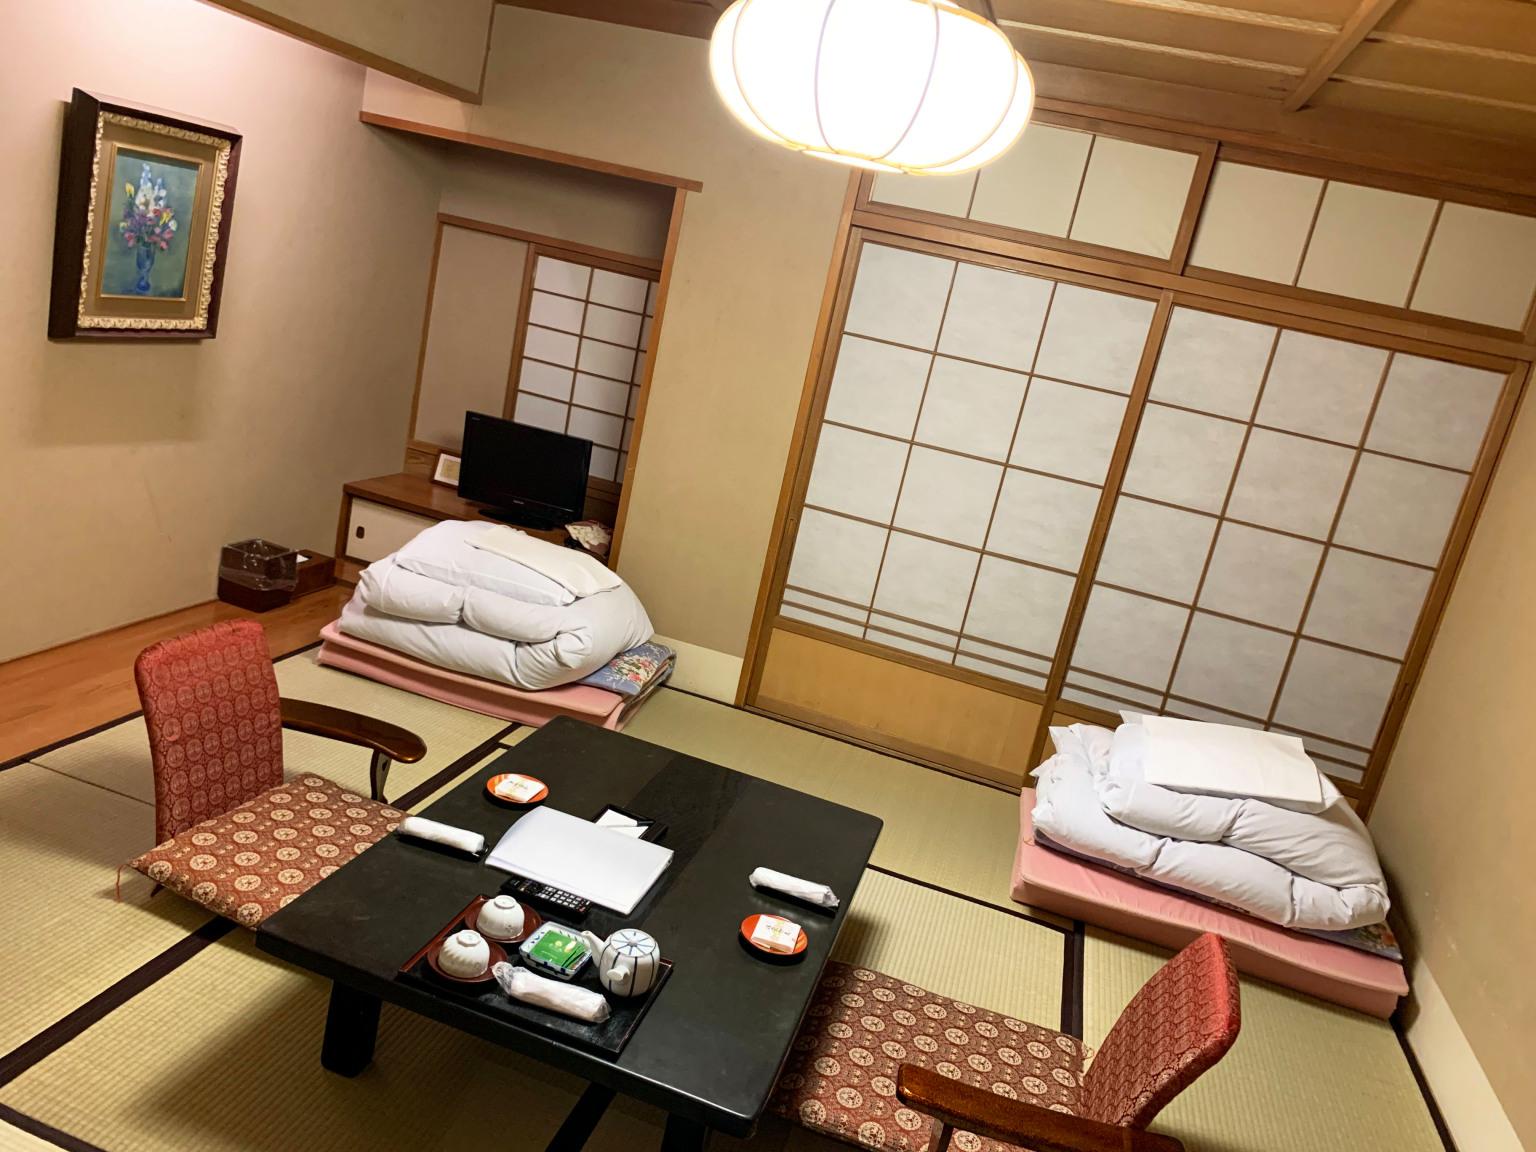 Houshi-Ryokan-onsen-hotel-oldest-in-world-Japan-business-travel-Hoshi-accommodation-stay-photos-reviews-Ishikawa-6.jpg